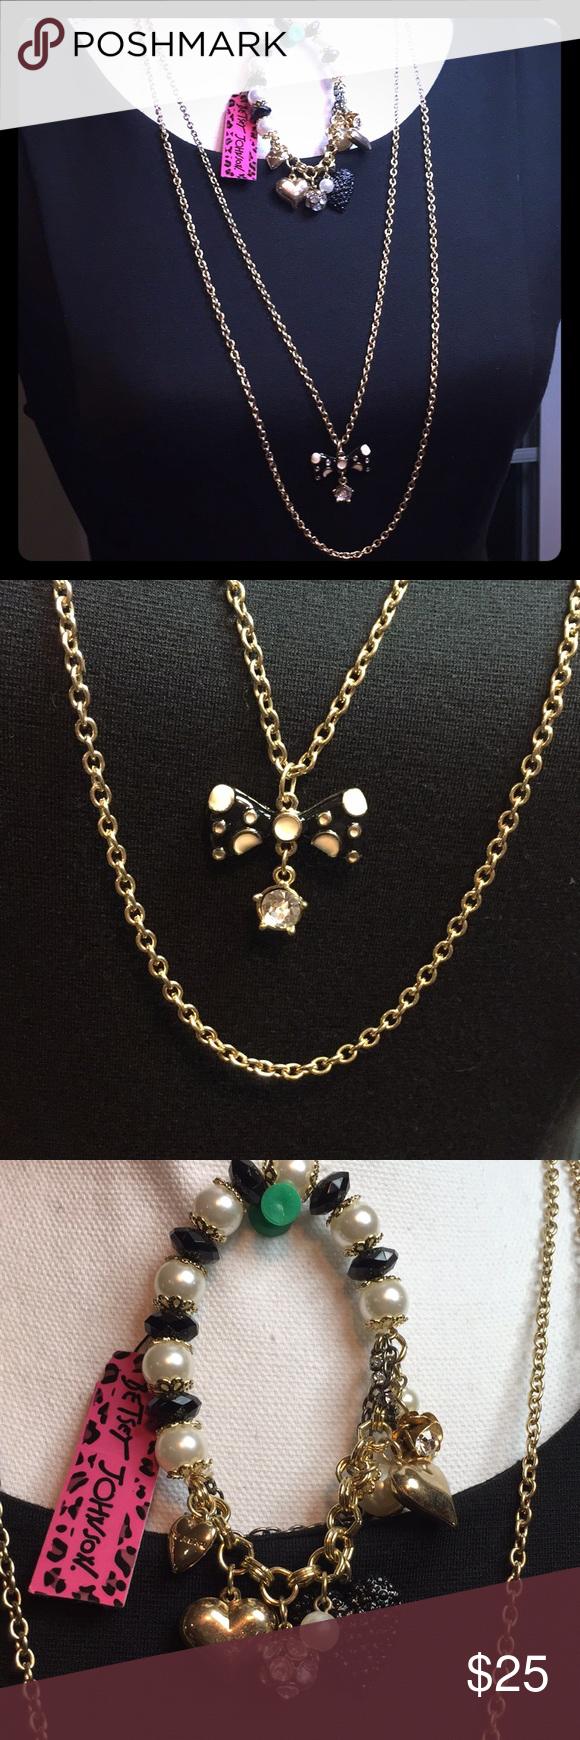 SALE!NWT Betsey Johnson Necklace and Bracelet Set! NWT ...